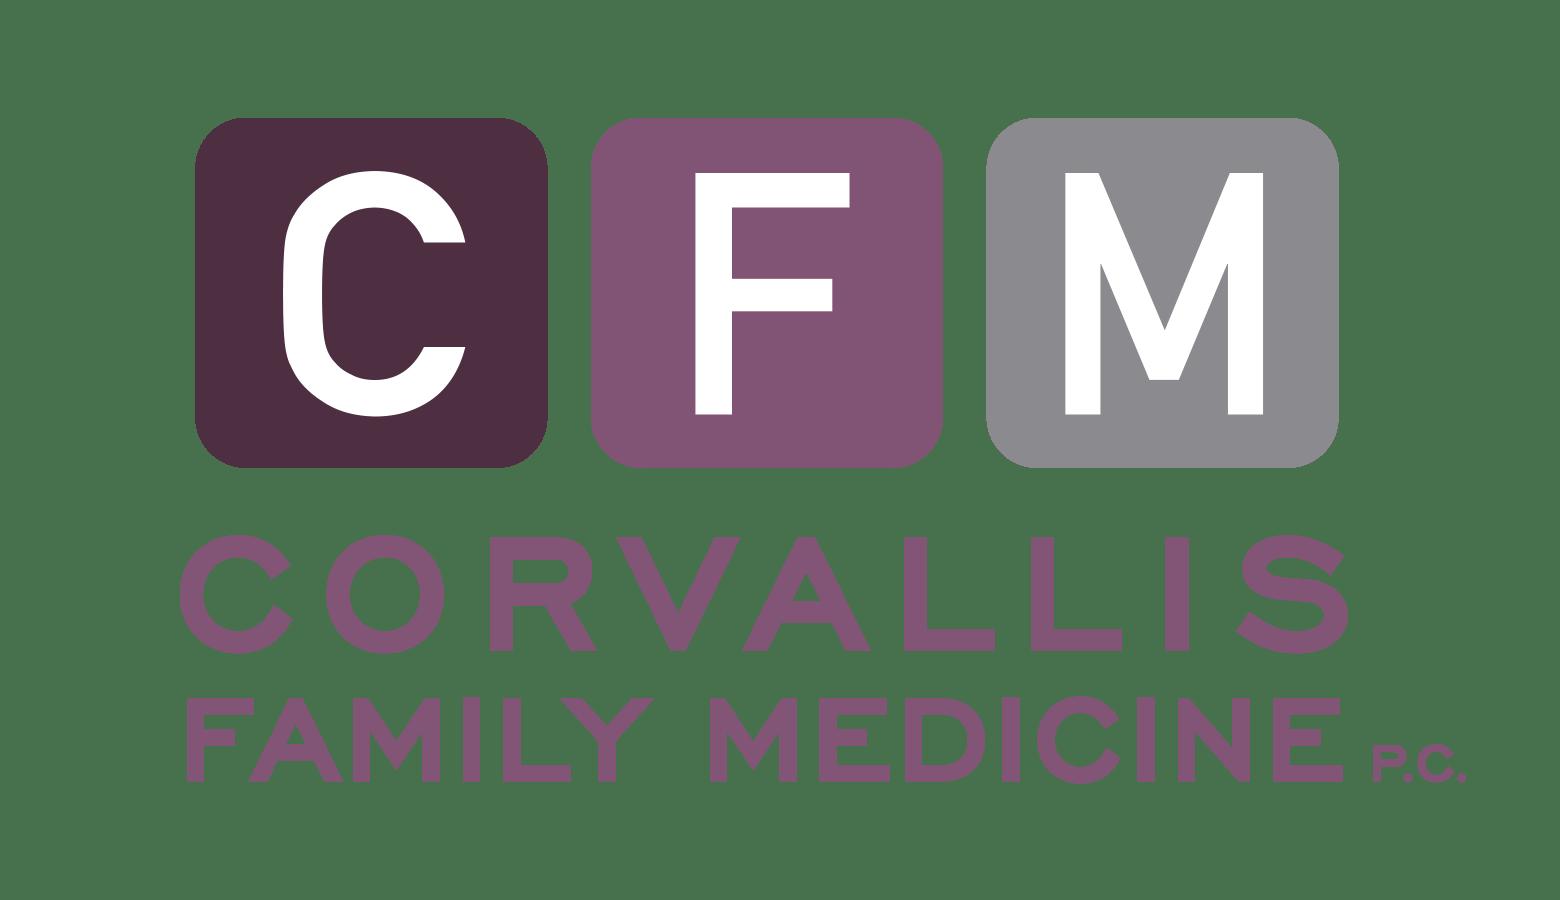 Patient Center - Corvallis Family Medicine